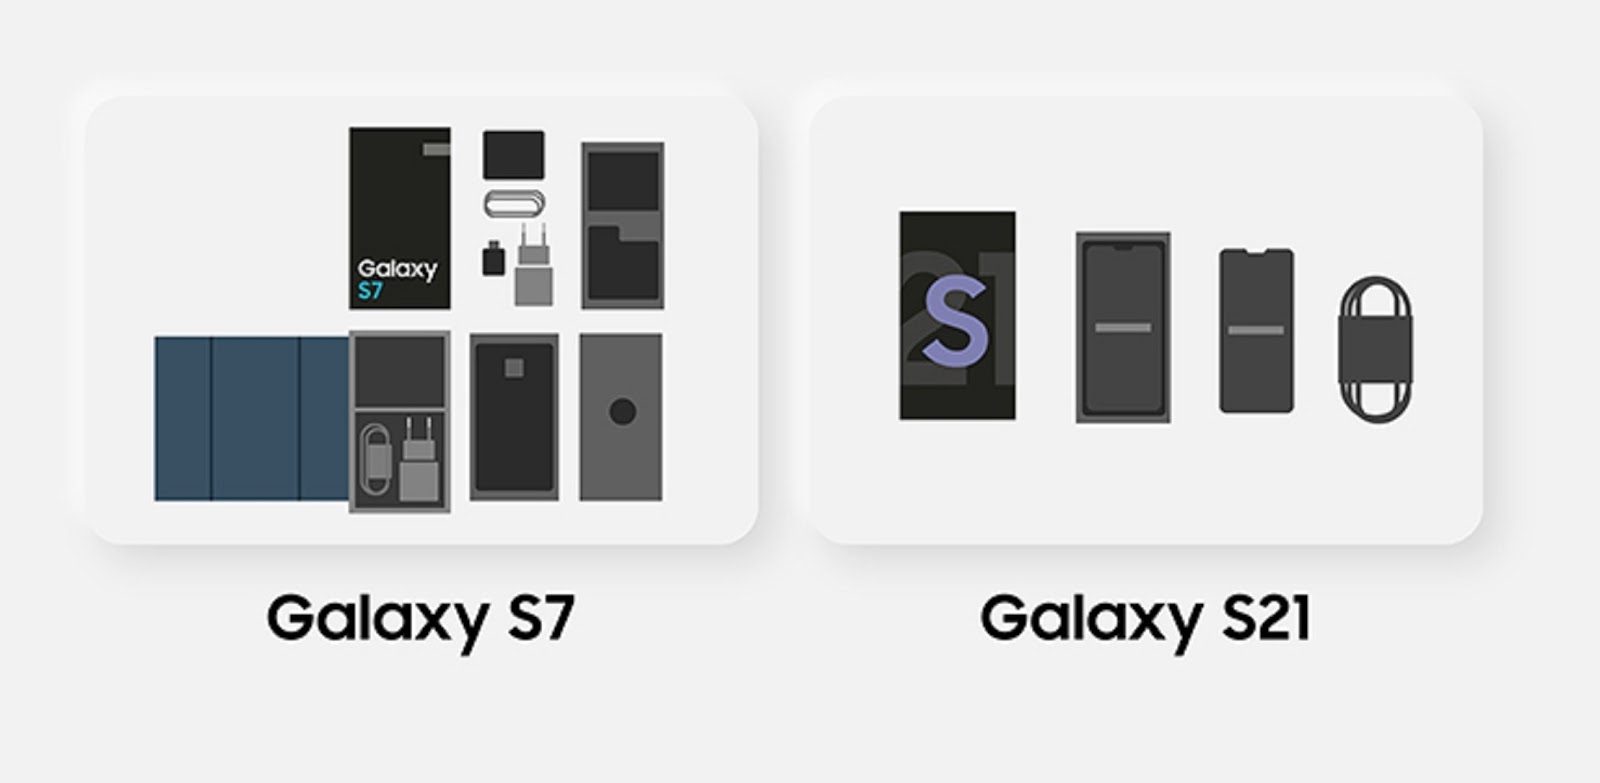 Samsung  ร่วมสร้างอนาคตที่ยั่งยืน ด้วยบรรจุภัณฑ์ที่เป็นมิตรต่อสิ่งแวดล้อมของ Galaxy S Series